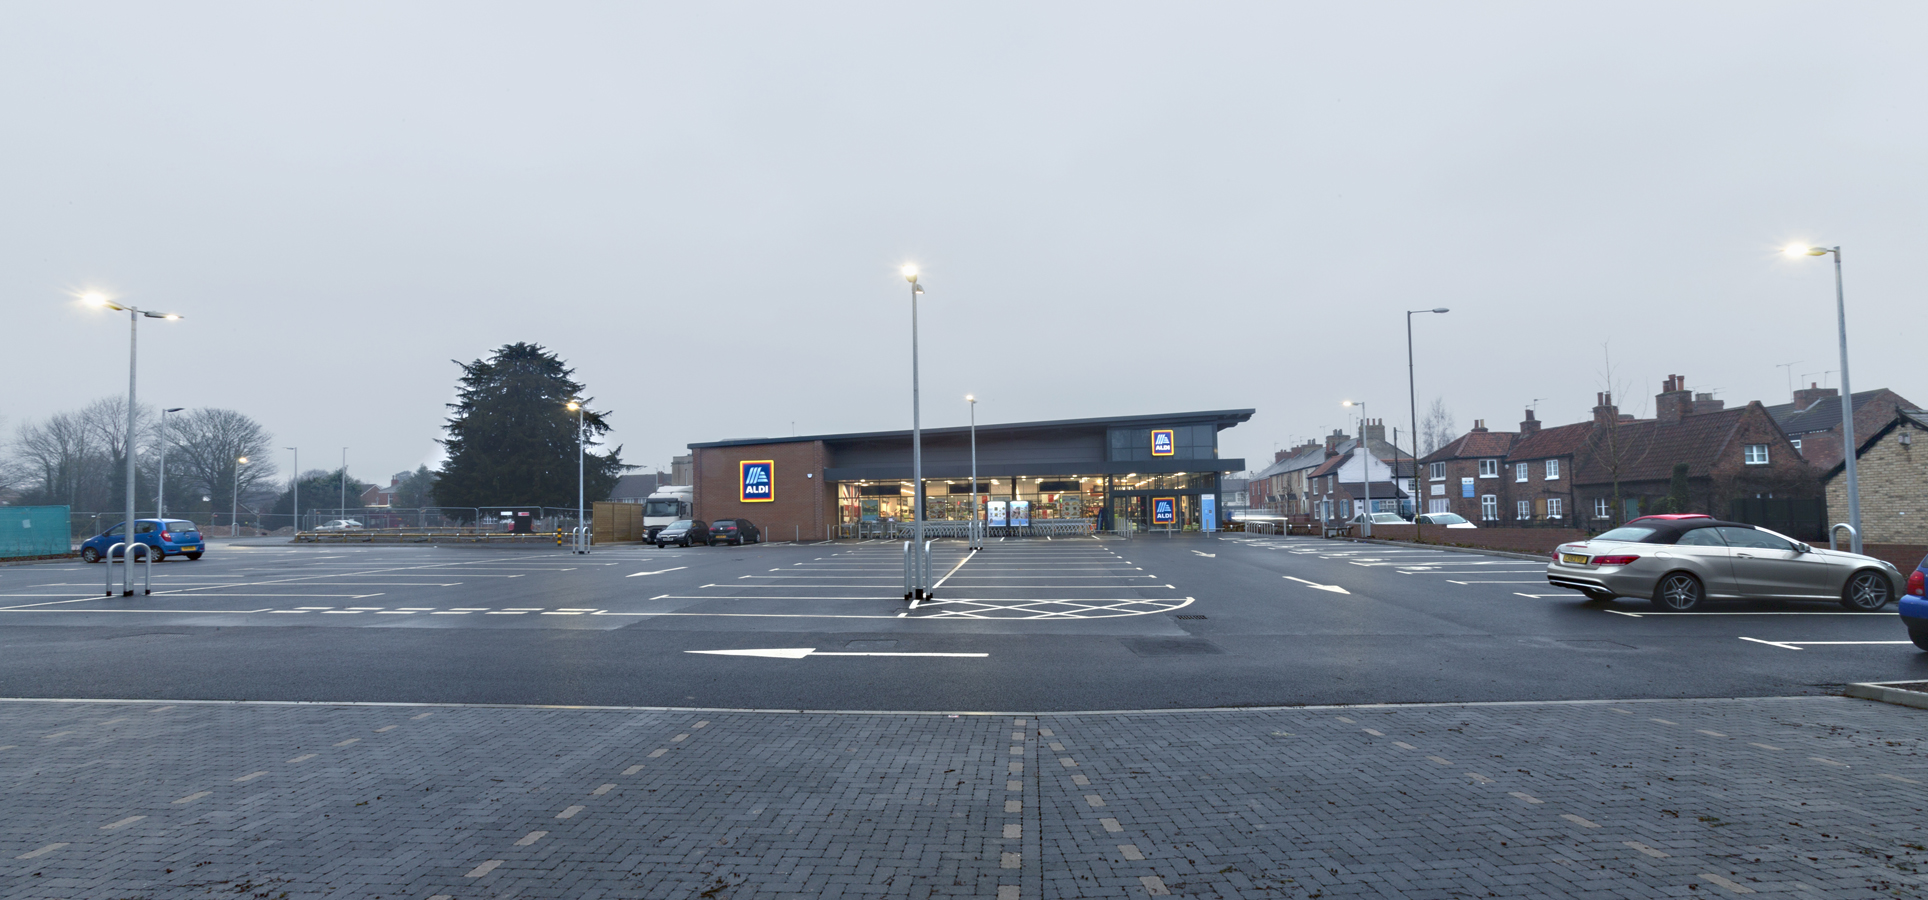 Aldi Food Store, Cottingham, Jessops Construction Ltd